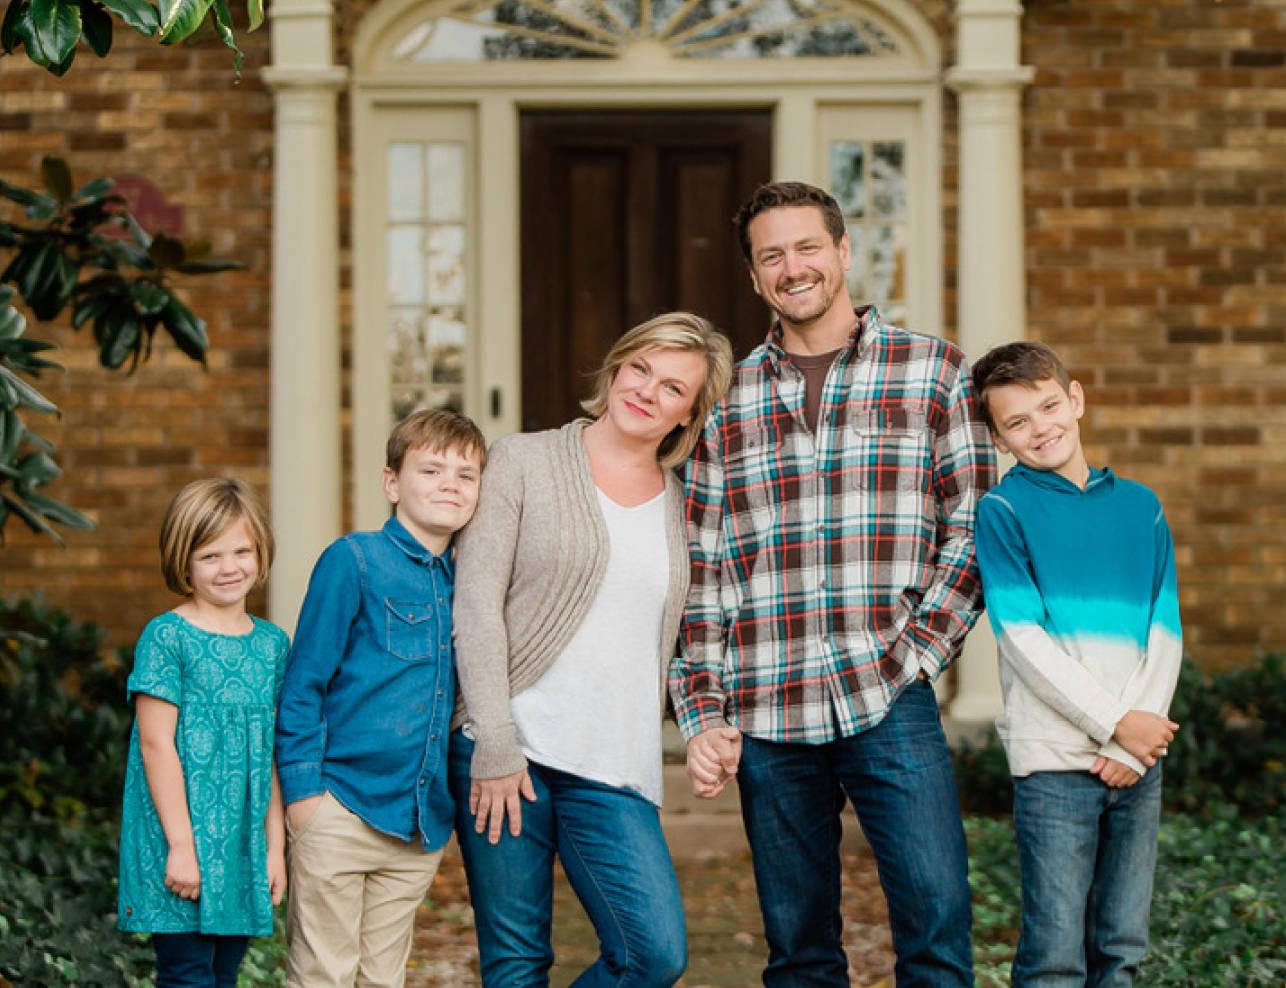 The Decisive moment family photograph